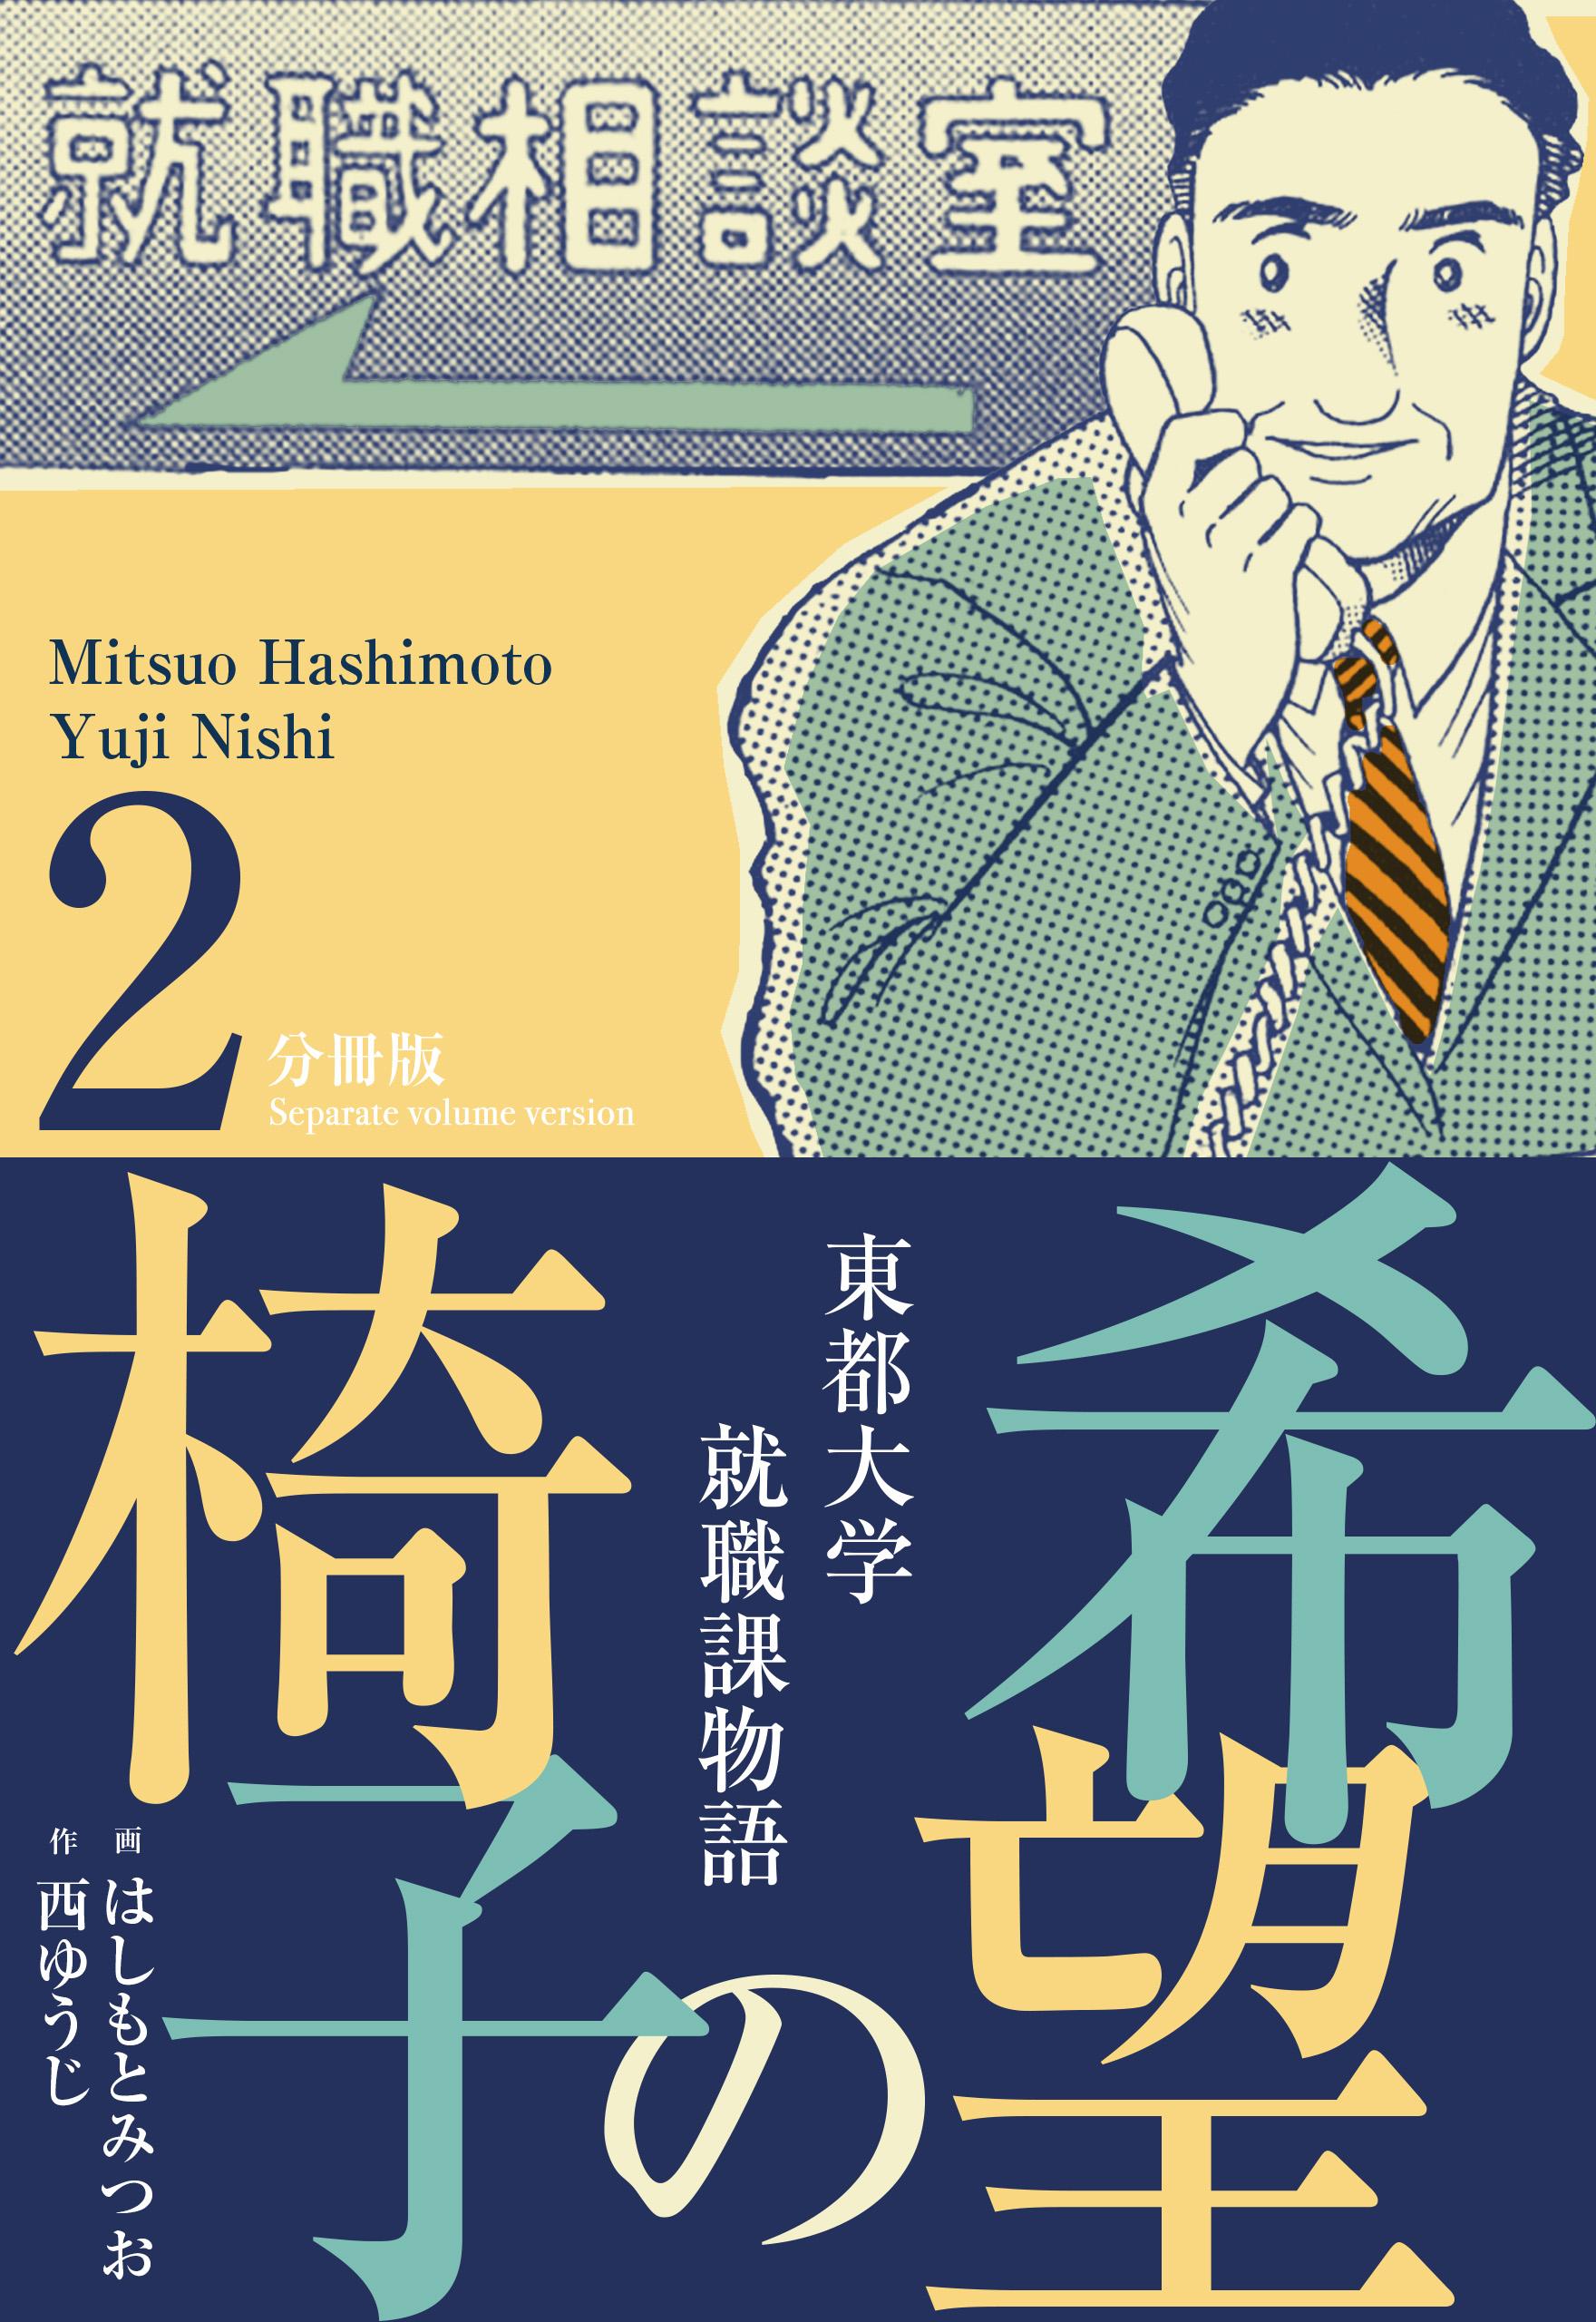 希望の椅子【分冊版】(第2巻)